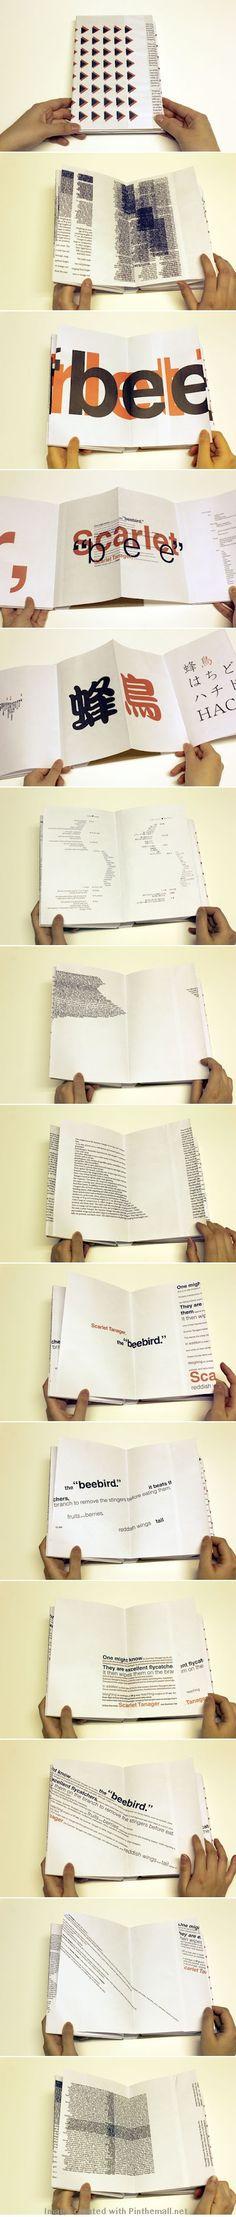 Erica Kitamura: Experimental Book Layout